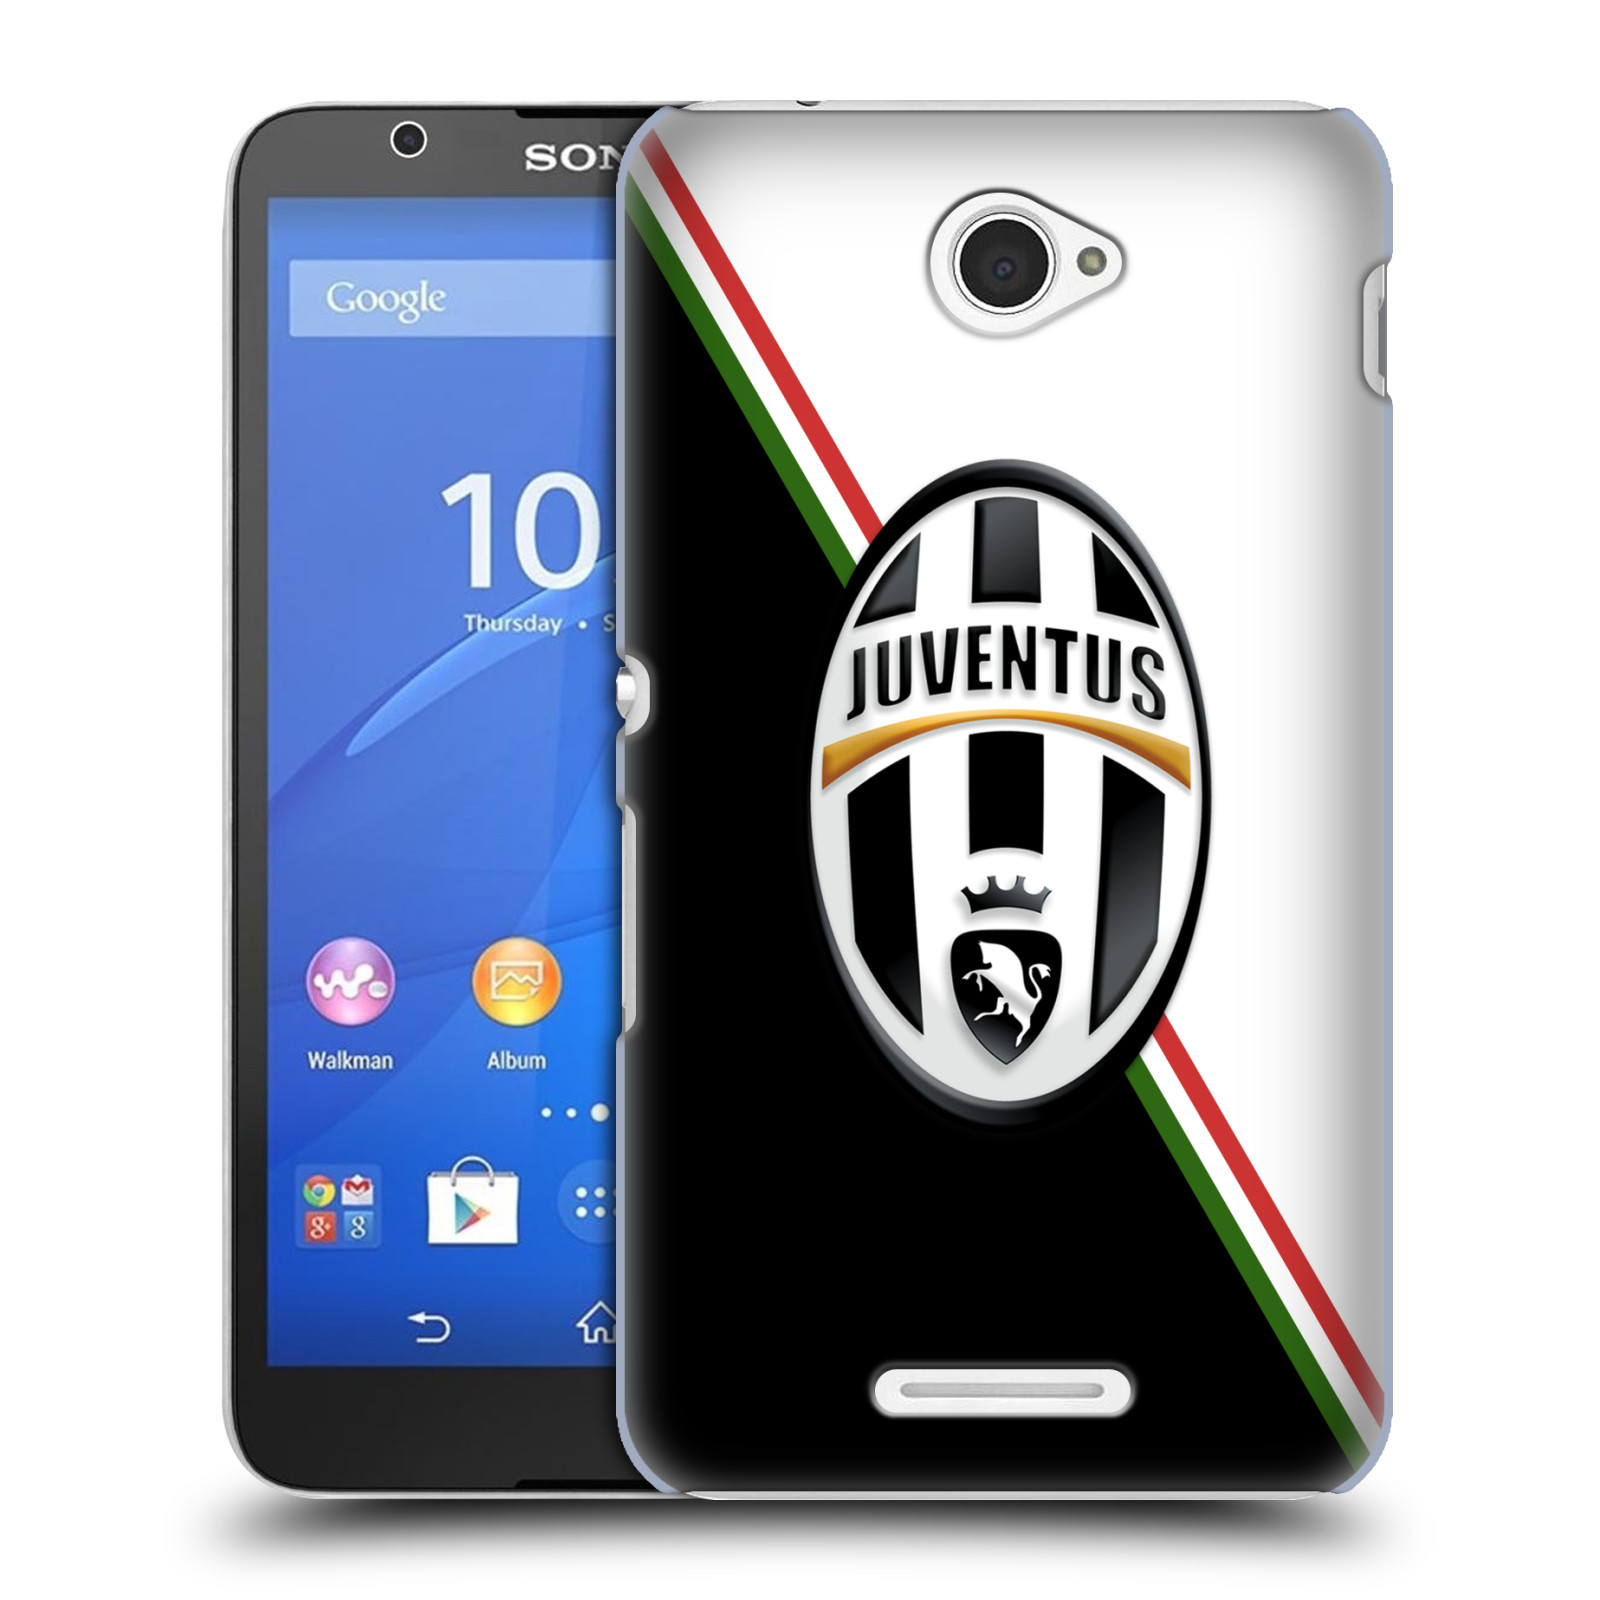 Plastové pouzdro na mobil Sony Xperia E4 E2105 HEAD CASE Juventus FC - Black and White (Plastový kryt či obal na mobilní telefon Juventus FC Official pro Sony Xperia E4 a E4 Dual SIM)